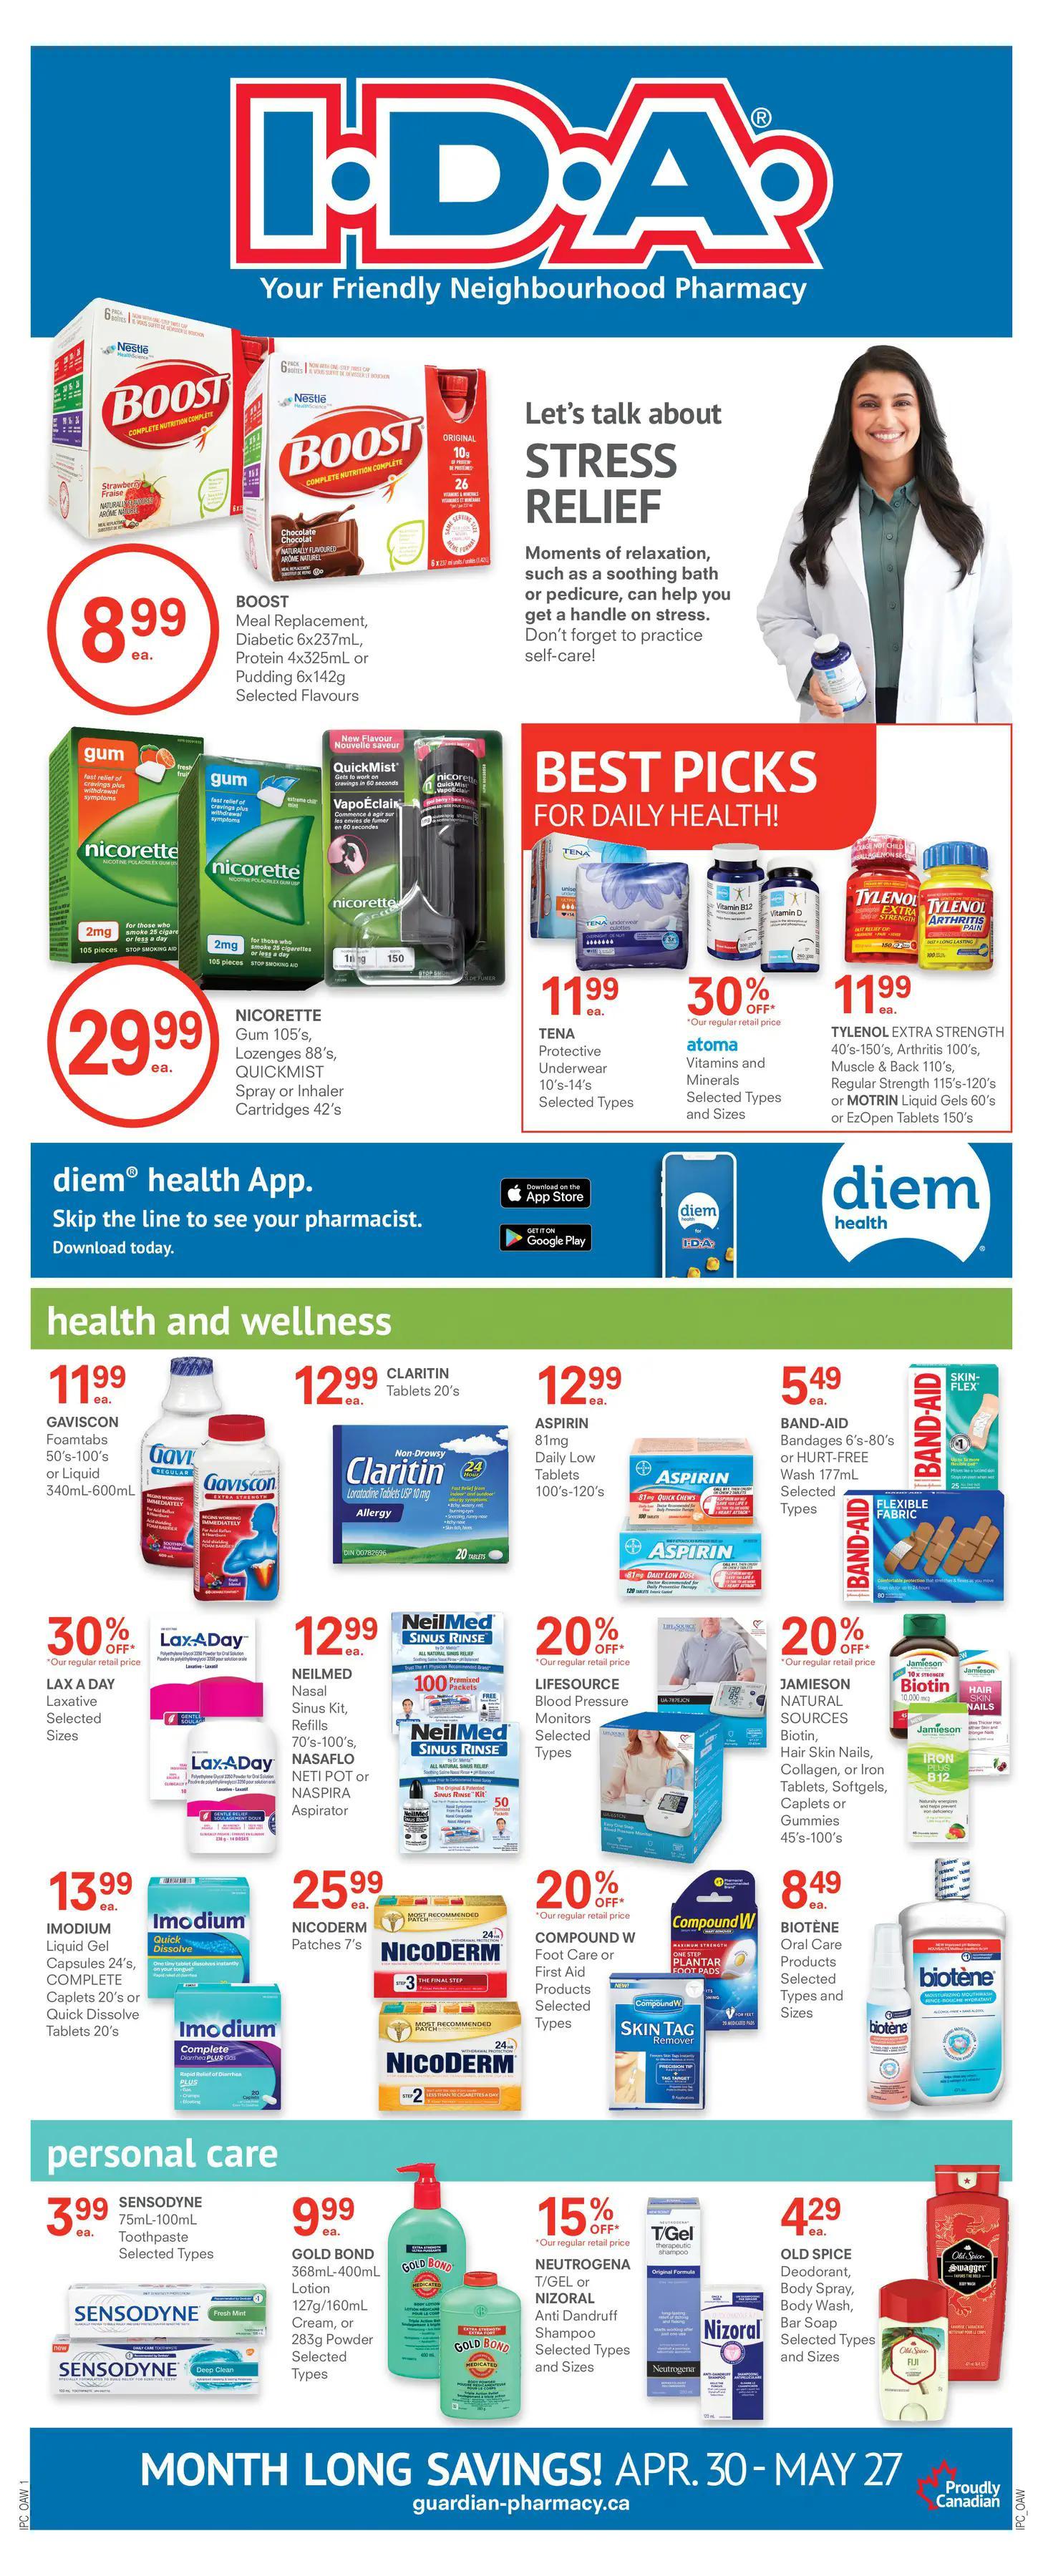 Guardian IDA Pharmacies - Monthly Savings